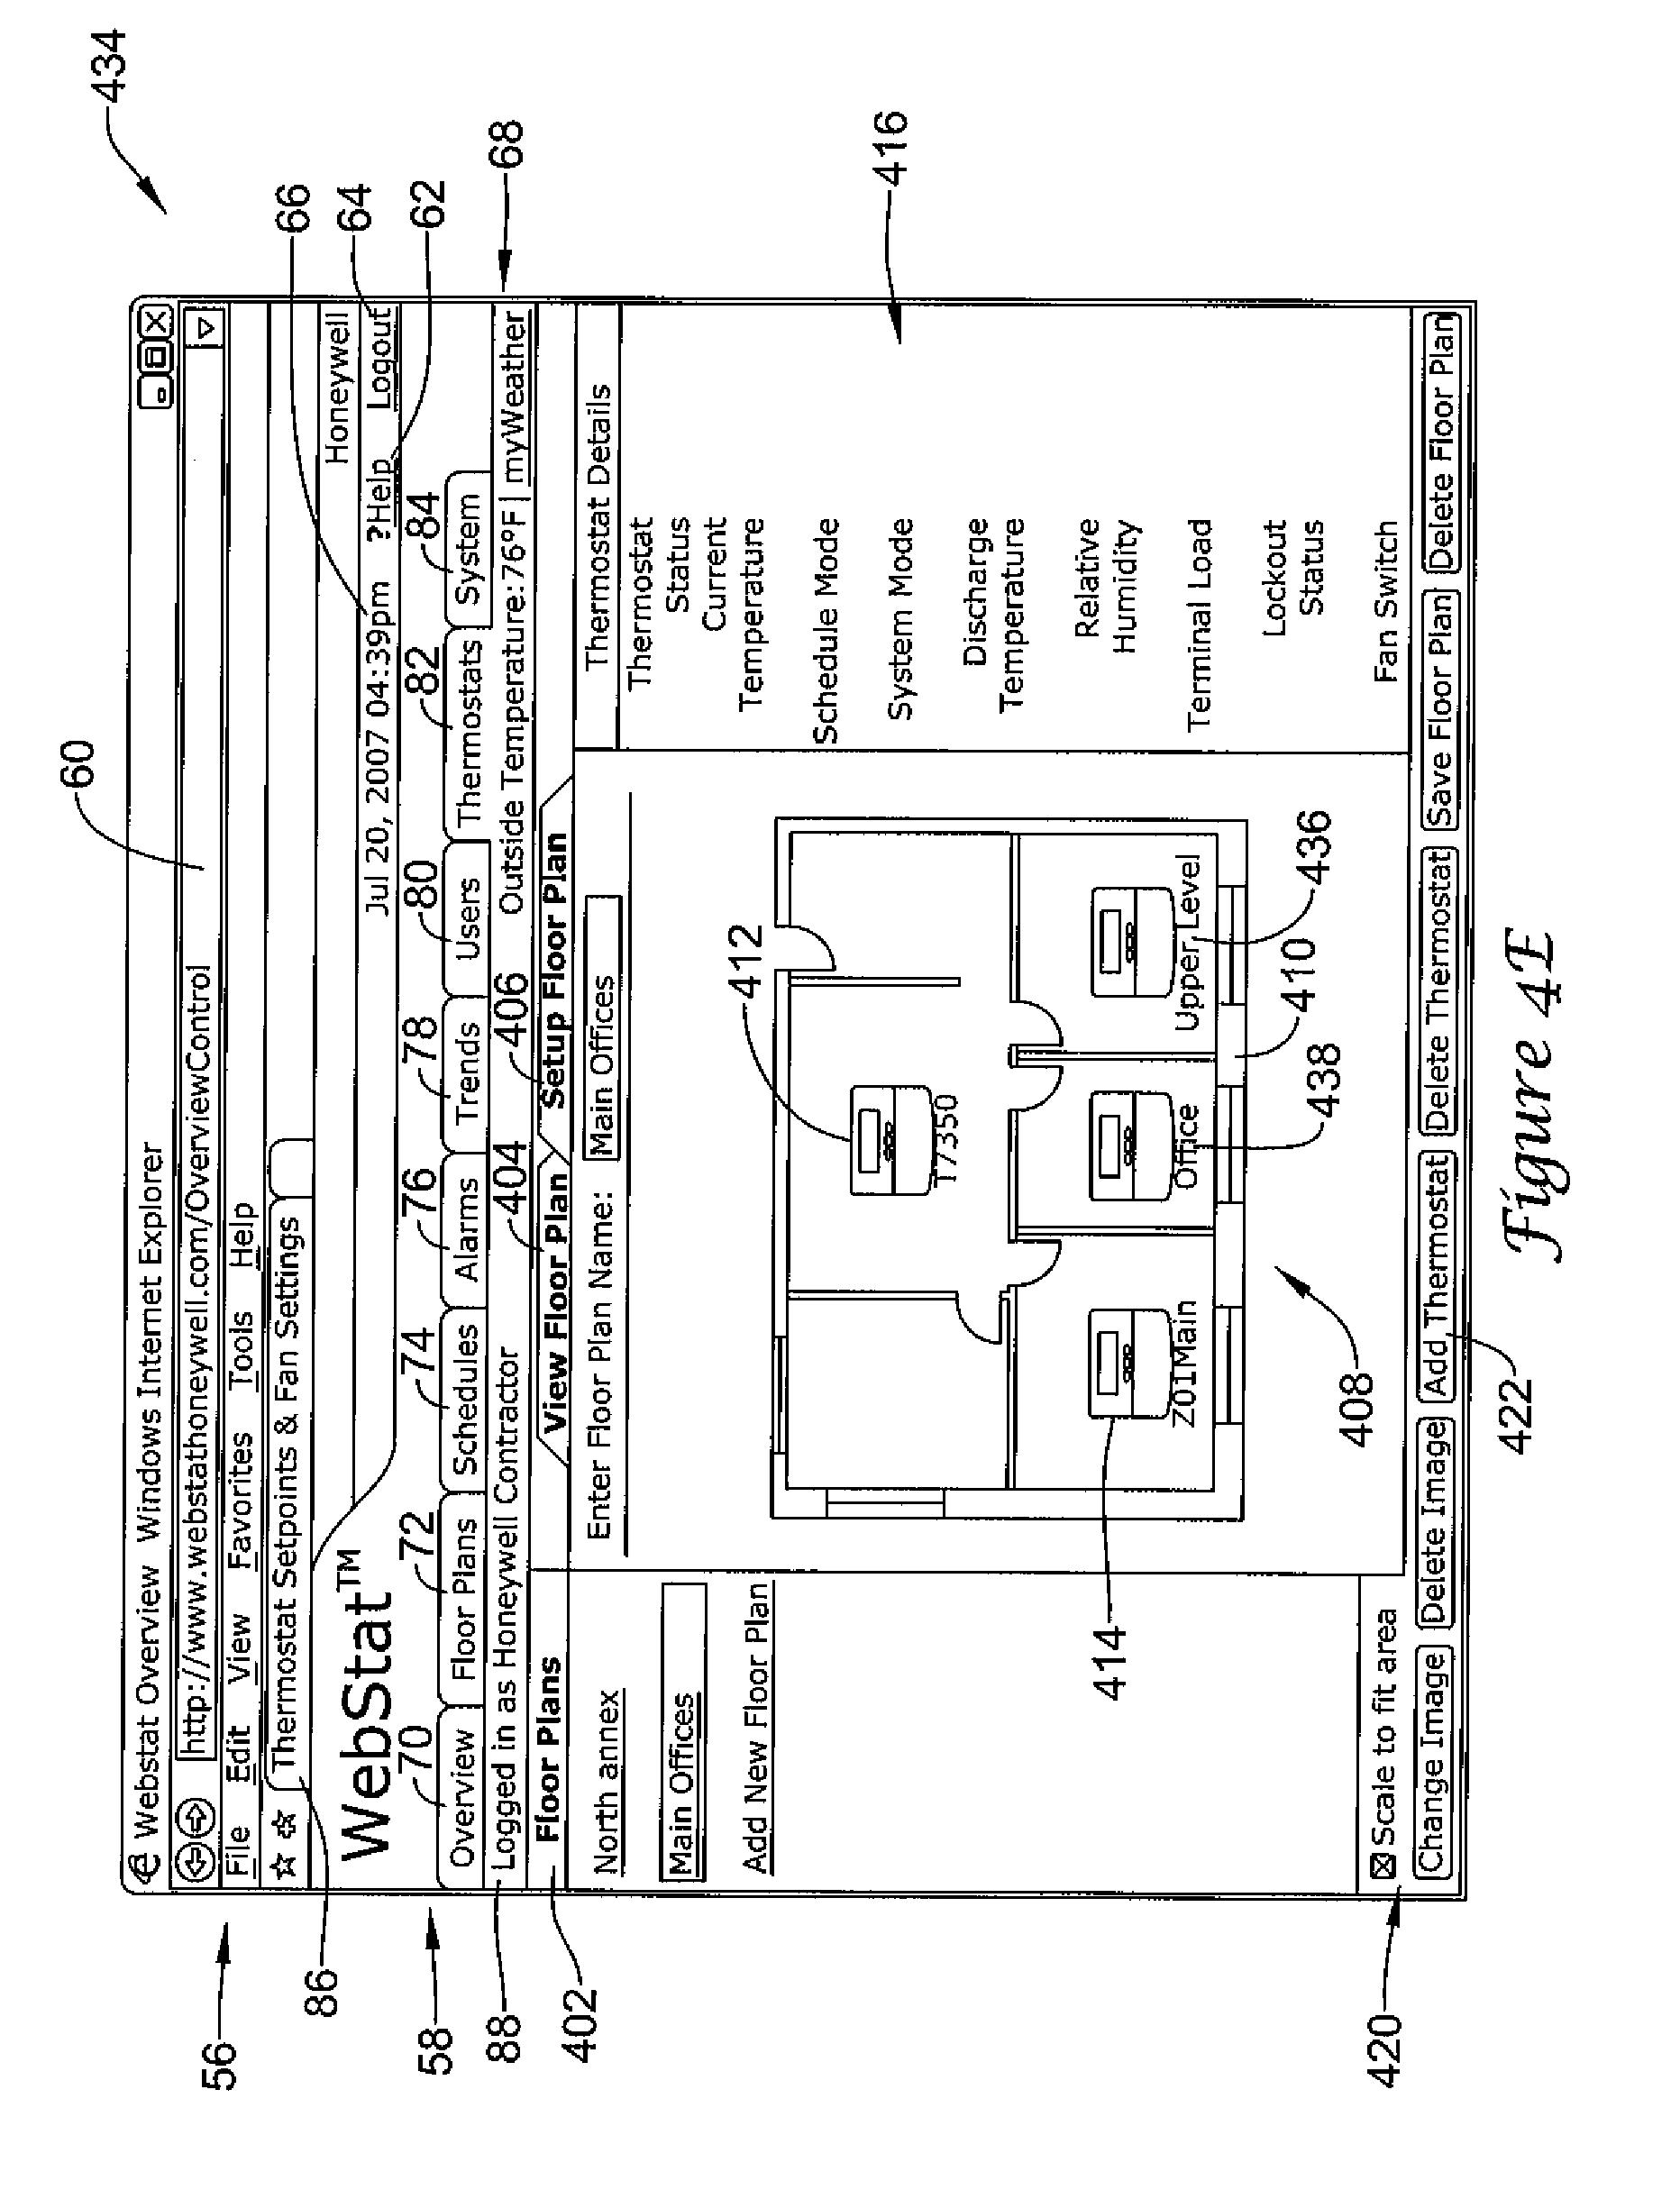 Trane Commercial Hvac Rtu Baystat 239 Thermostat Wiring Diagram Devilbiss Air Compressor Manual Pdf Diagrams